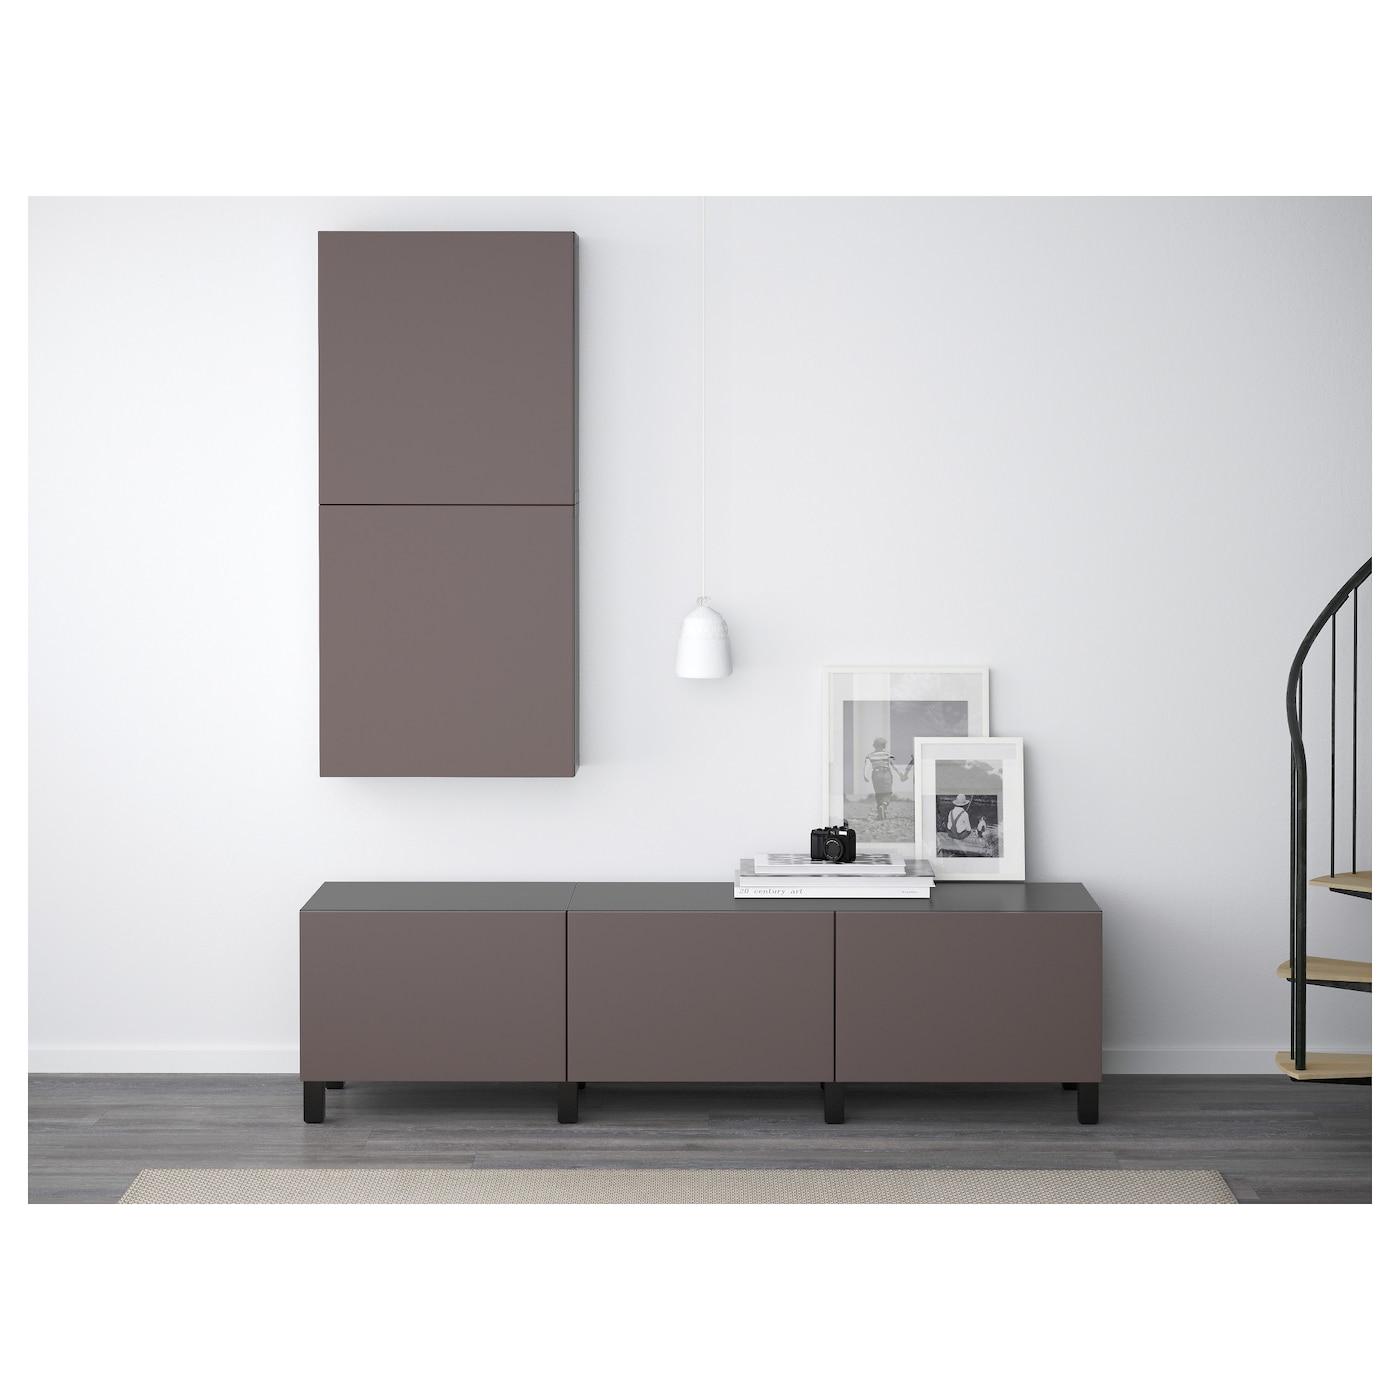 best wall cabinet with 2 doors black brown valviken dark brown 60x20x128 cm ikea. Black Bedroom Furniture Sets. Home Design Ideas